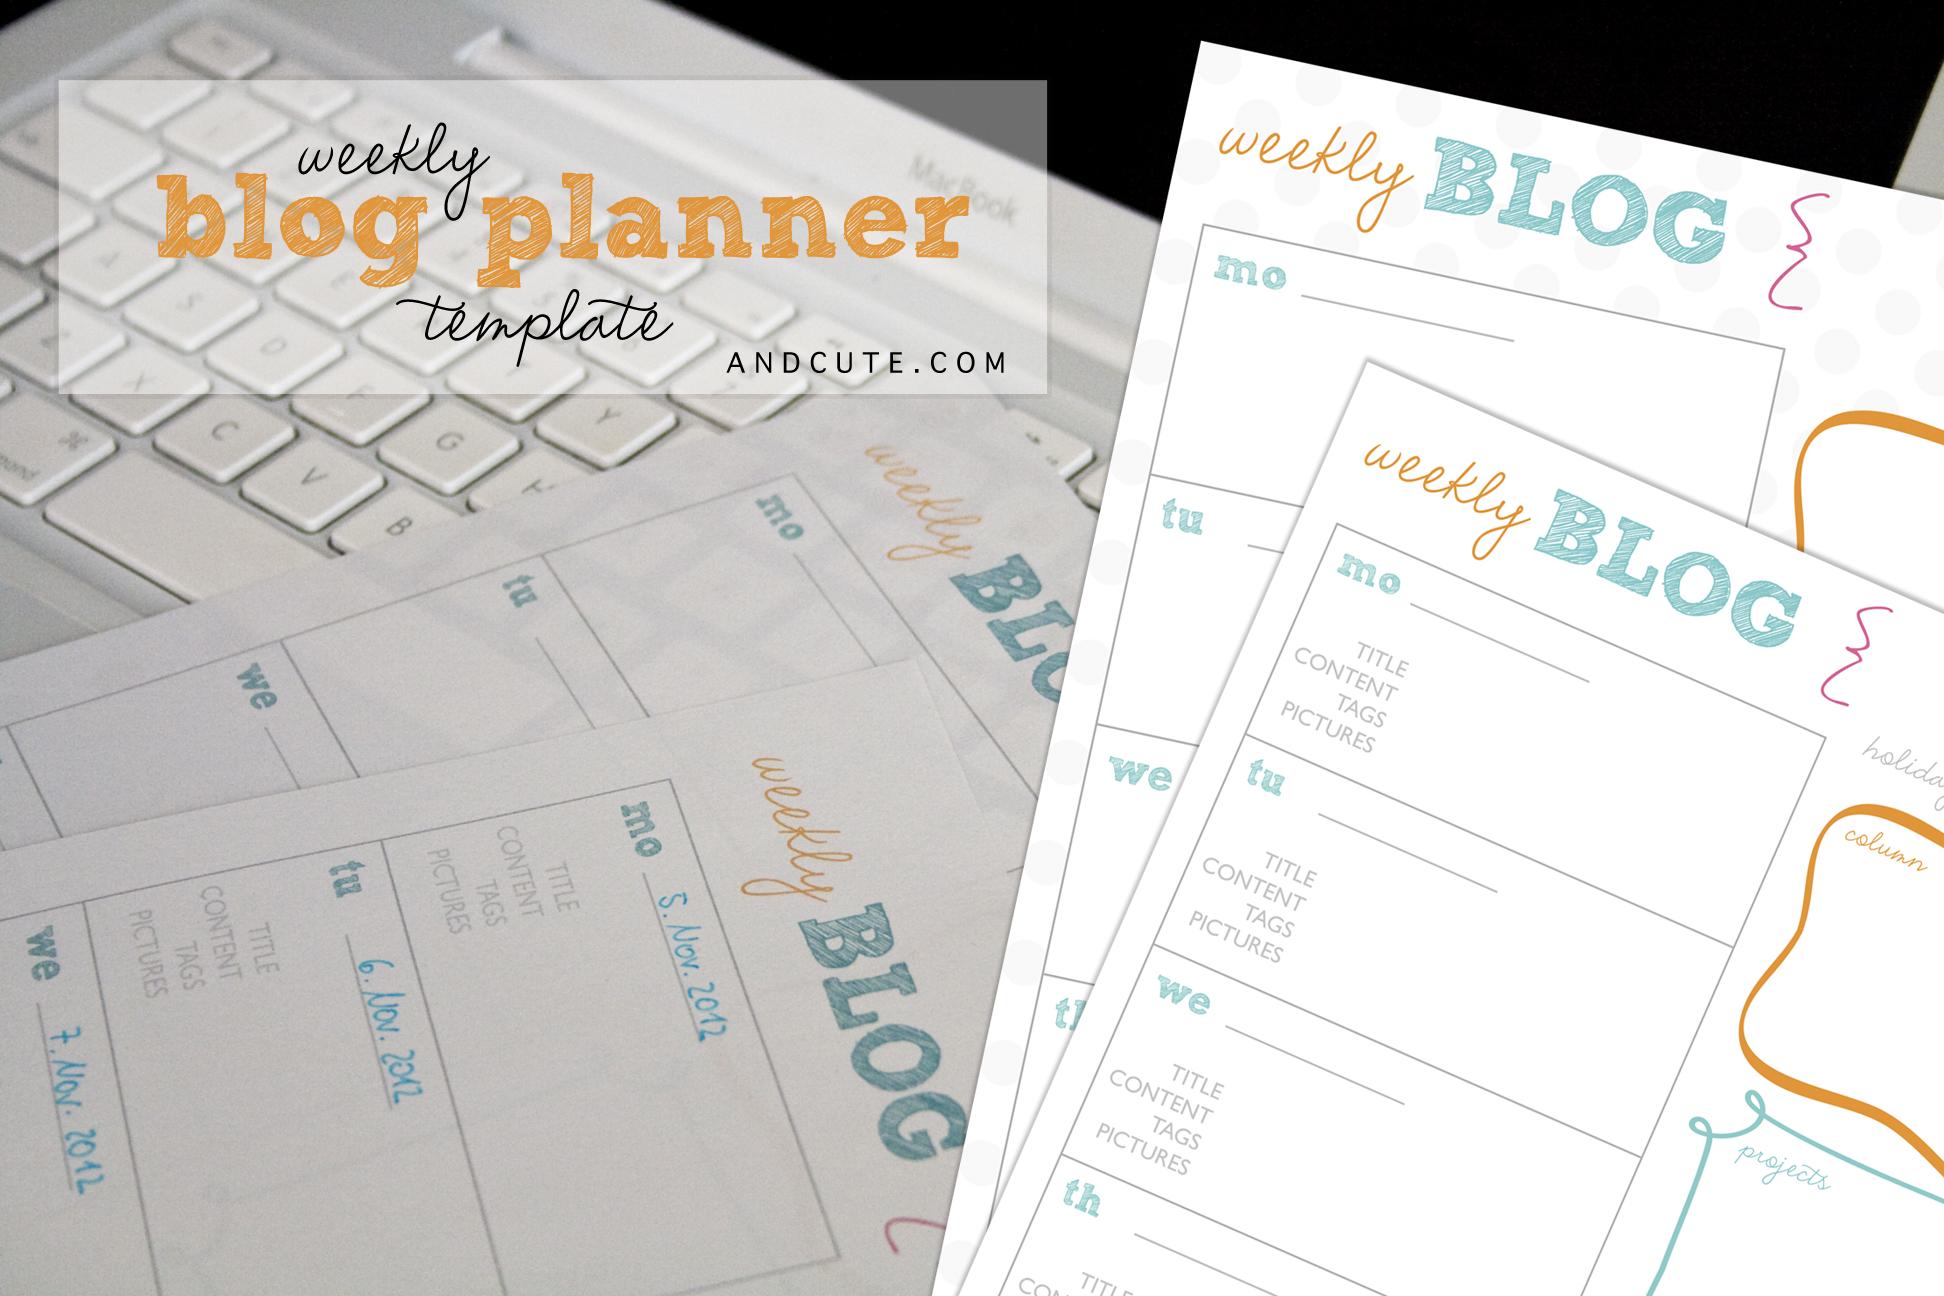 weekly blog planner printable template. Black Bedroom Furniture Sets. Home Design Ideas